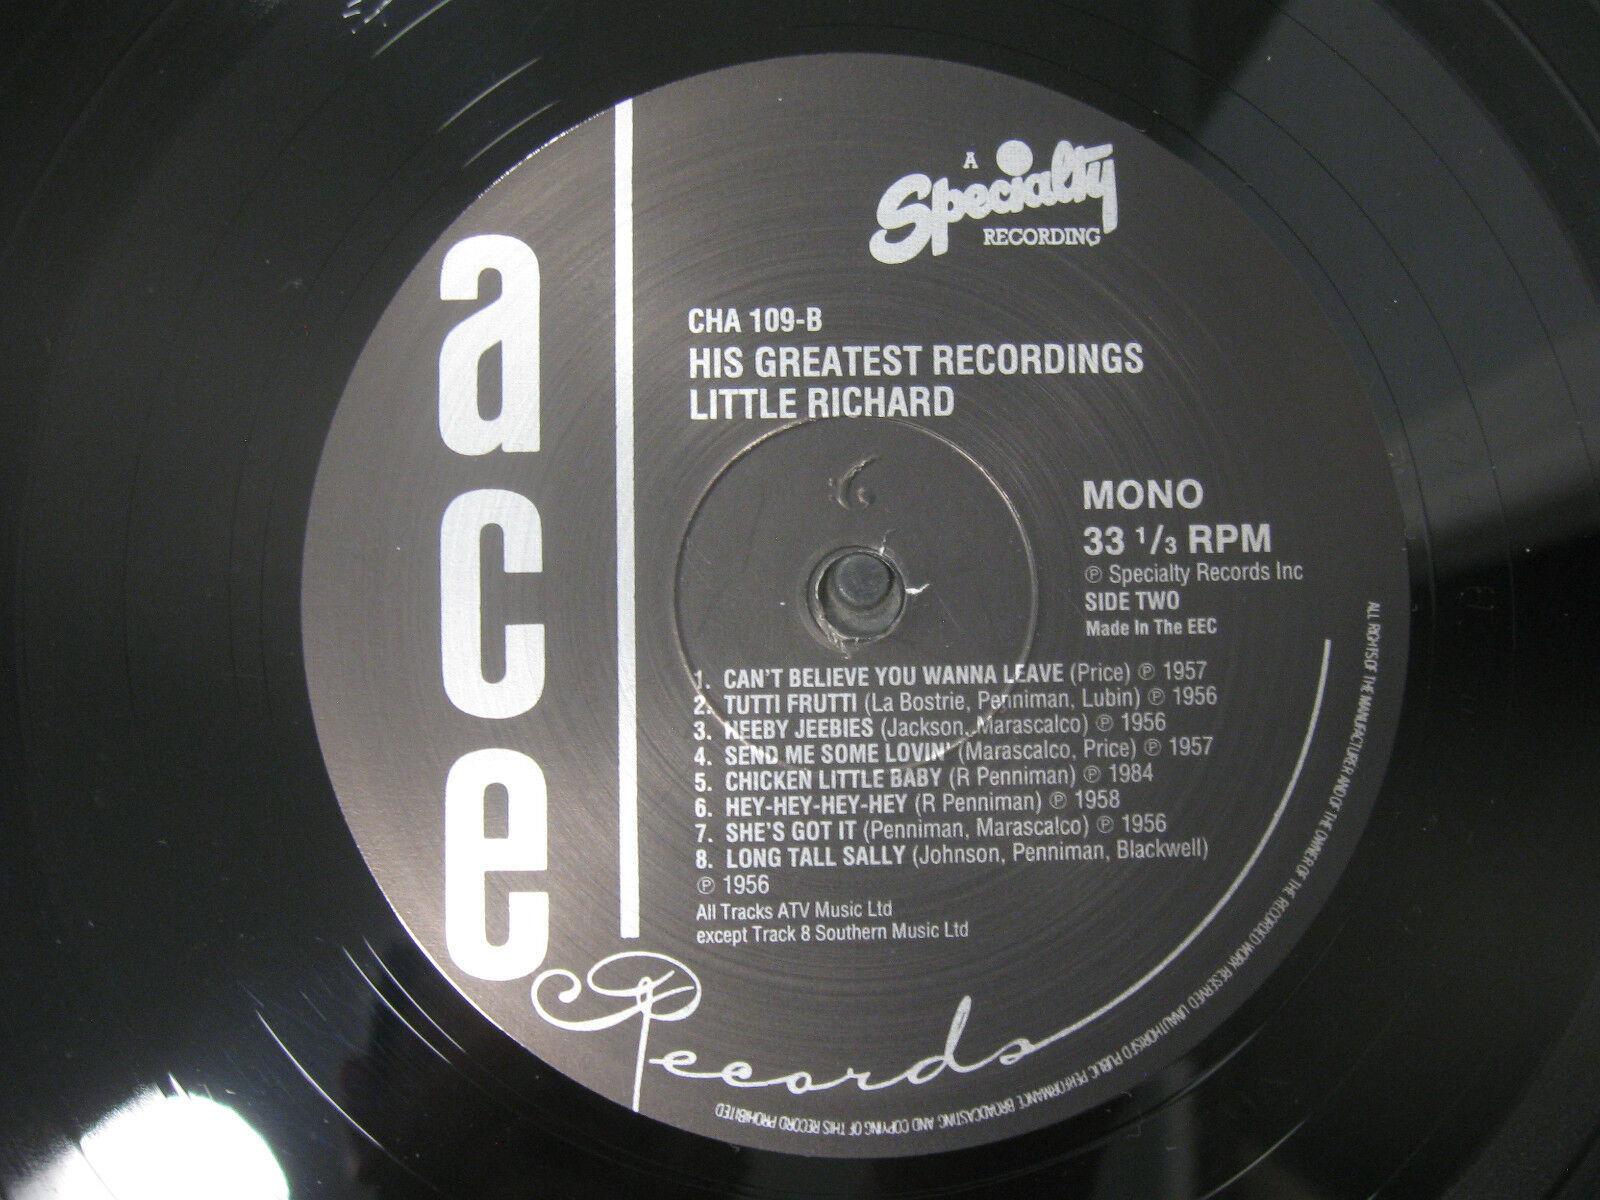 Little Richard His Greatest Recordings Ace CHA 109 Mono LP Record Album UK Press image 7